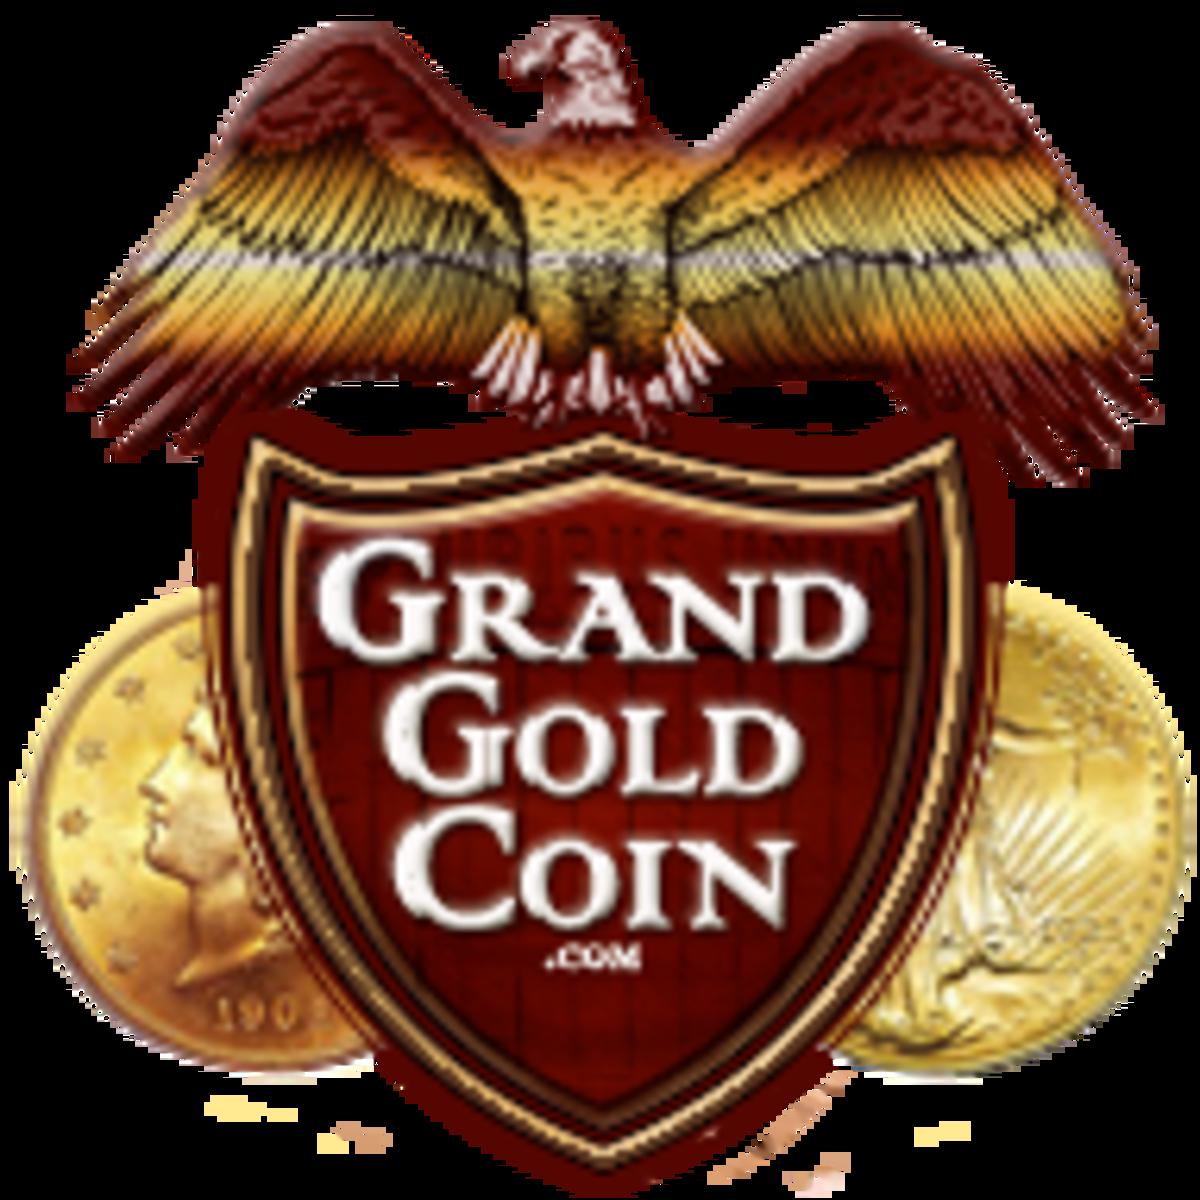 grandgoldcoins6